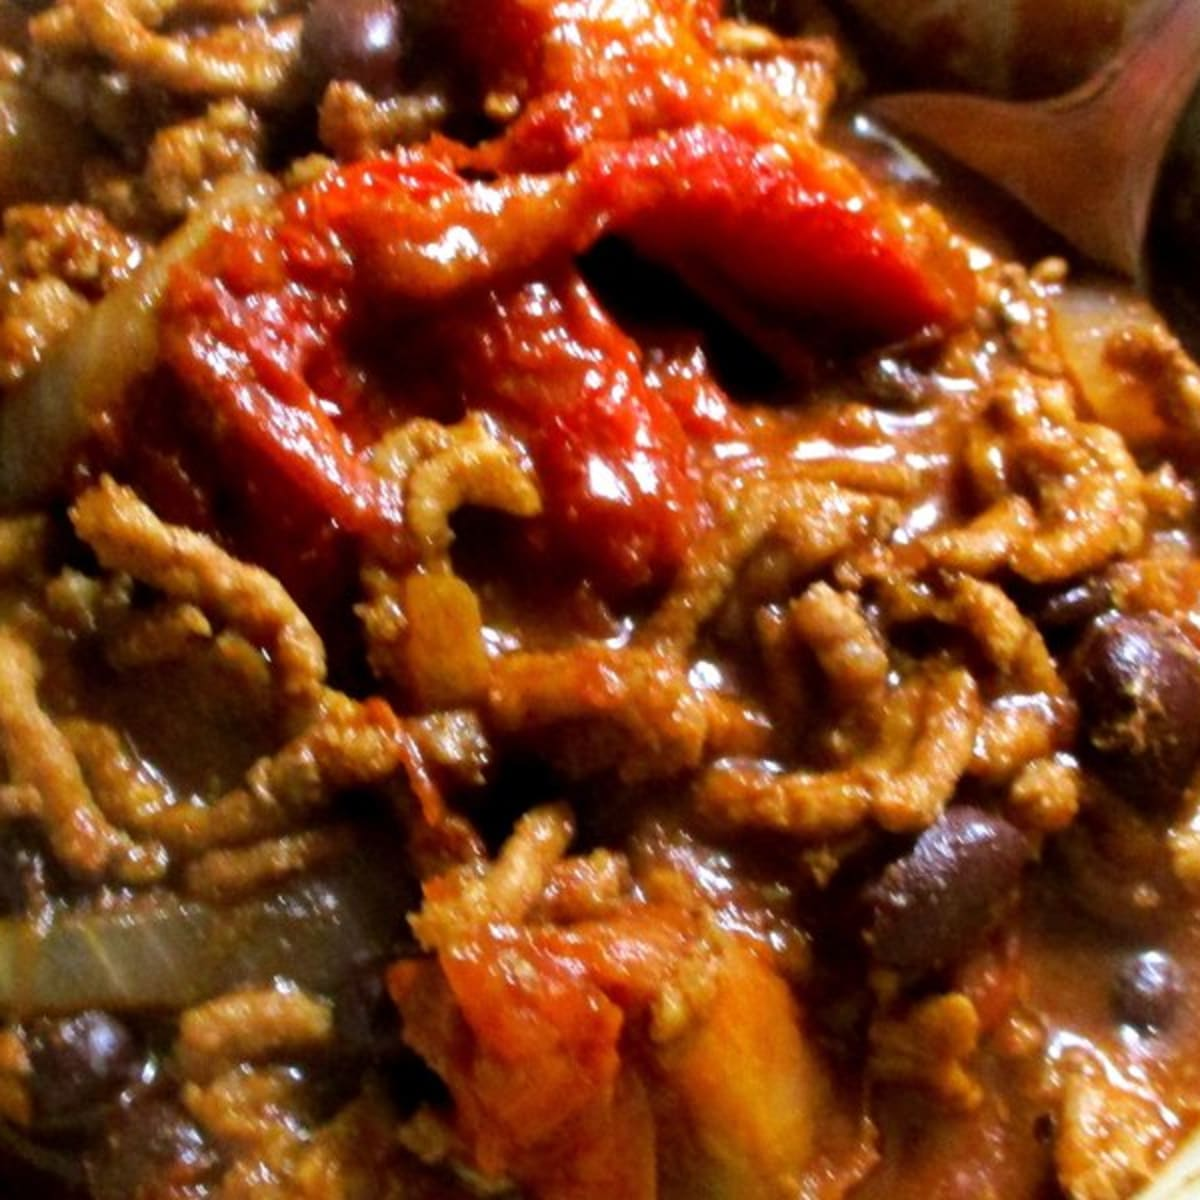 Black Bean Cocoa Chili Delishably Food And Drink